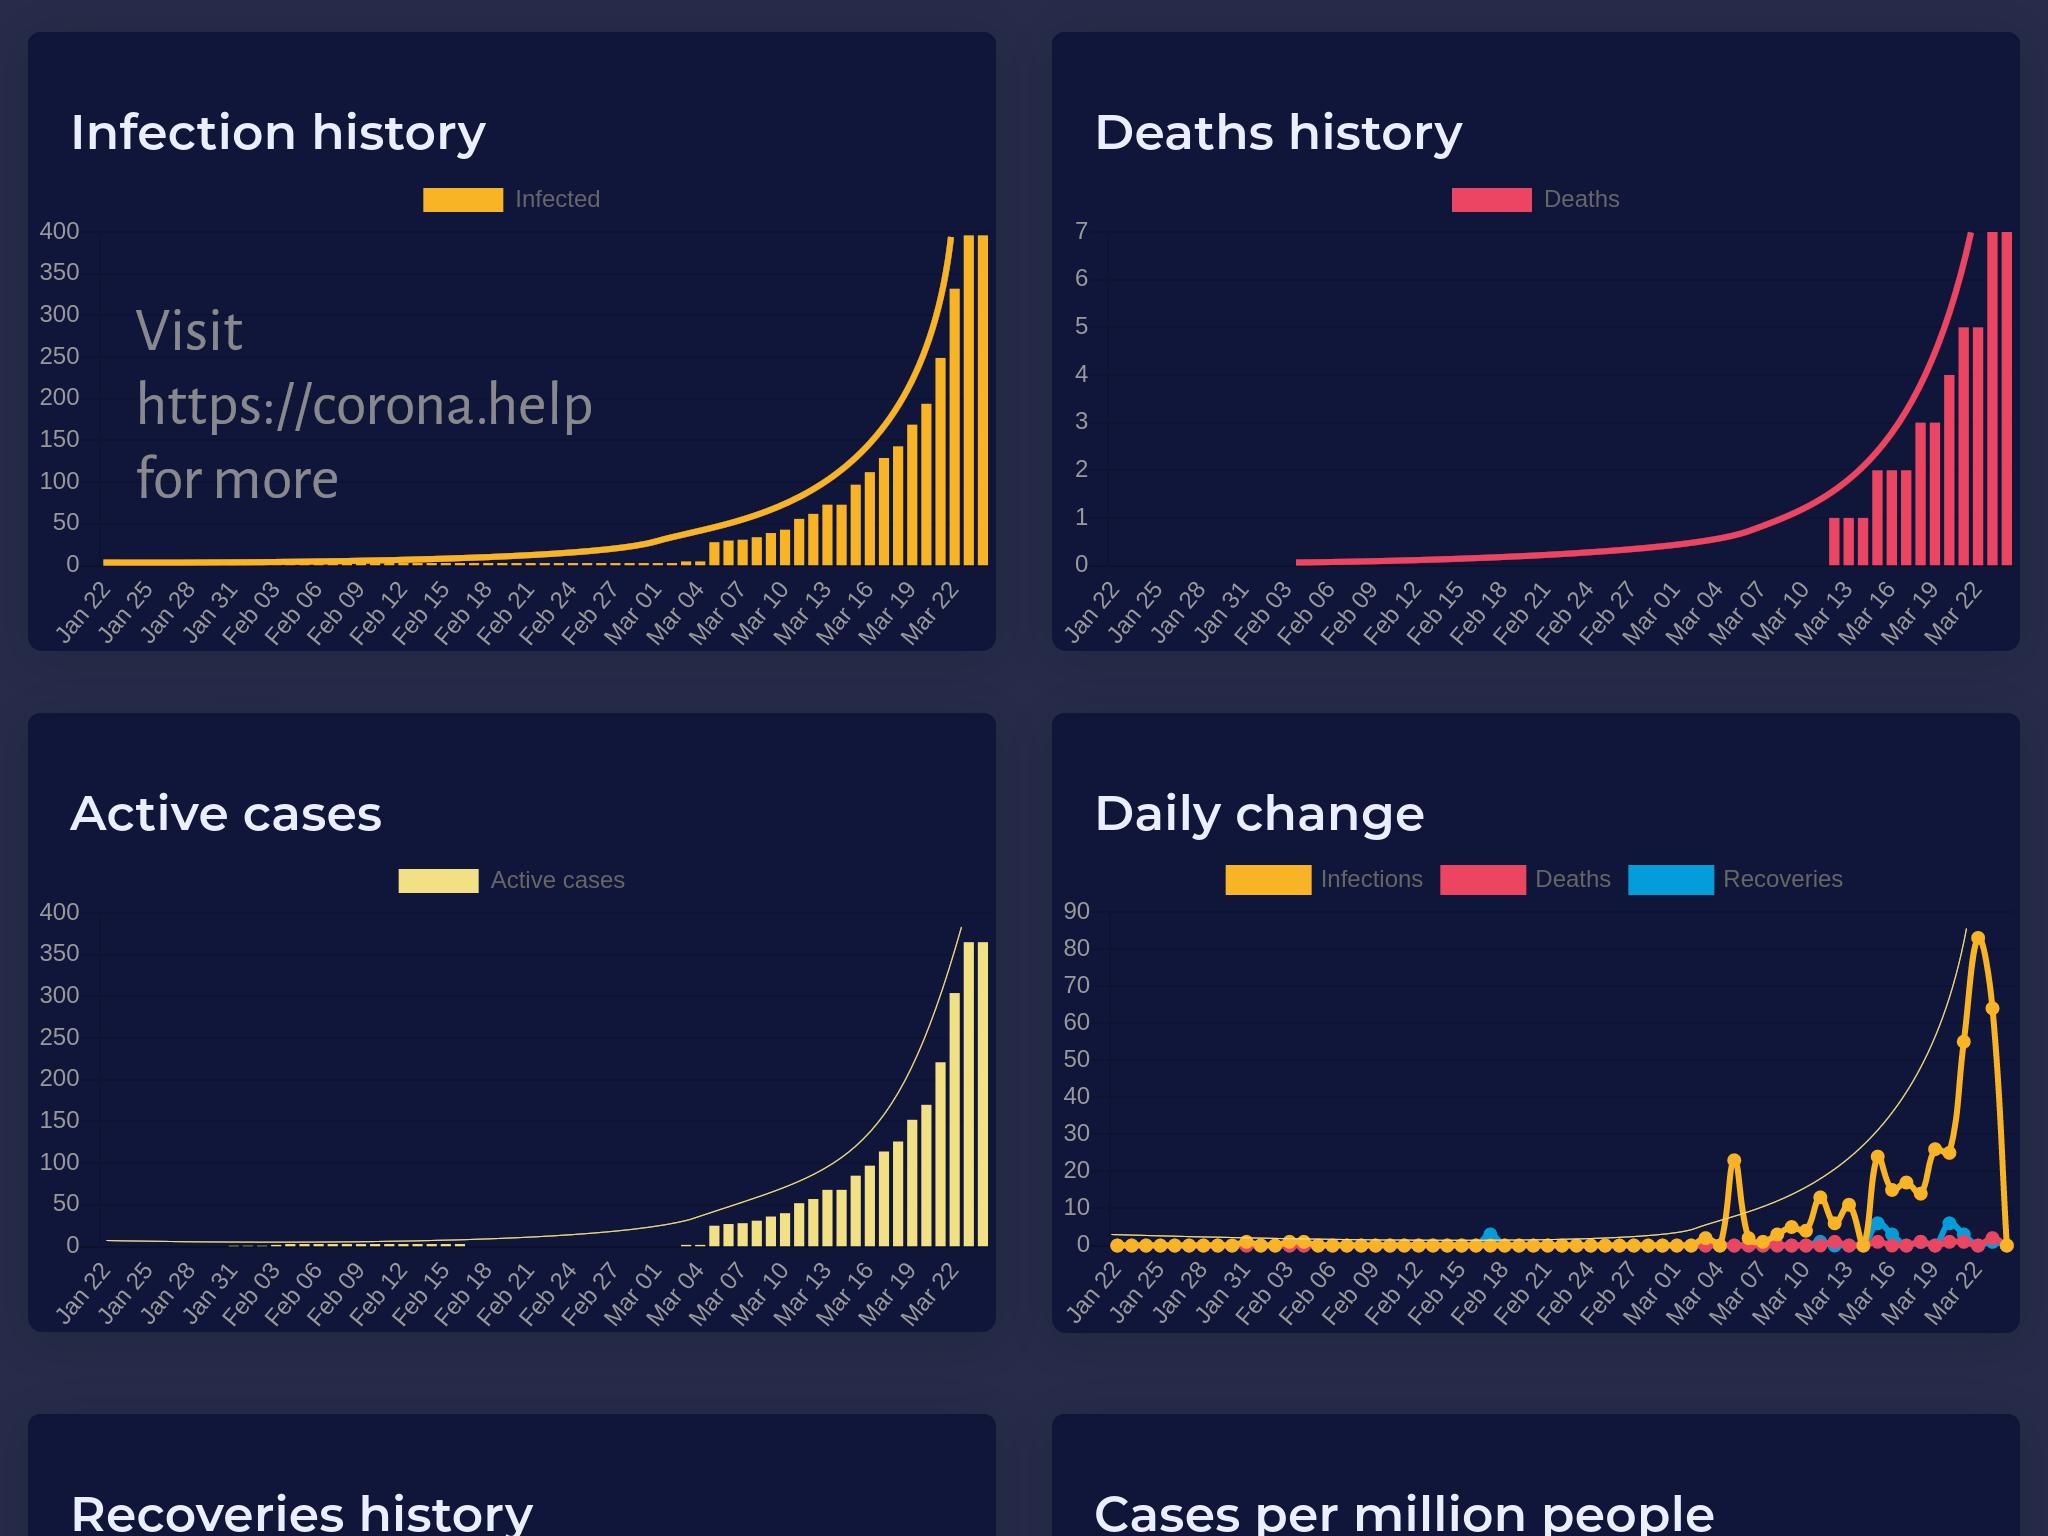 India statistics: Coronavirus infections as of 22 Mar 2019 (https://corona.help)